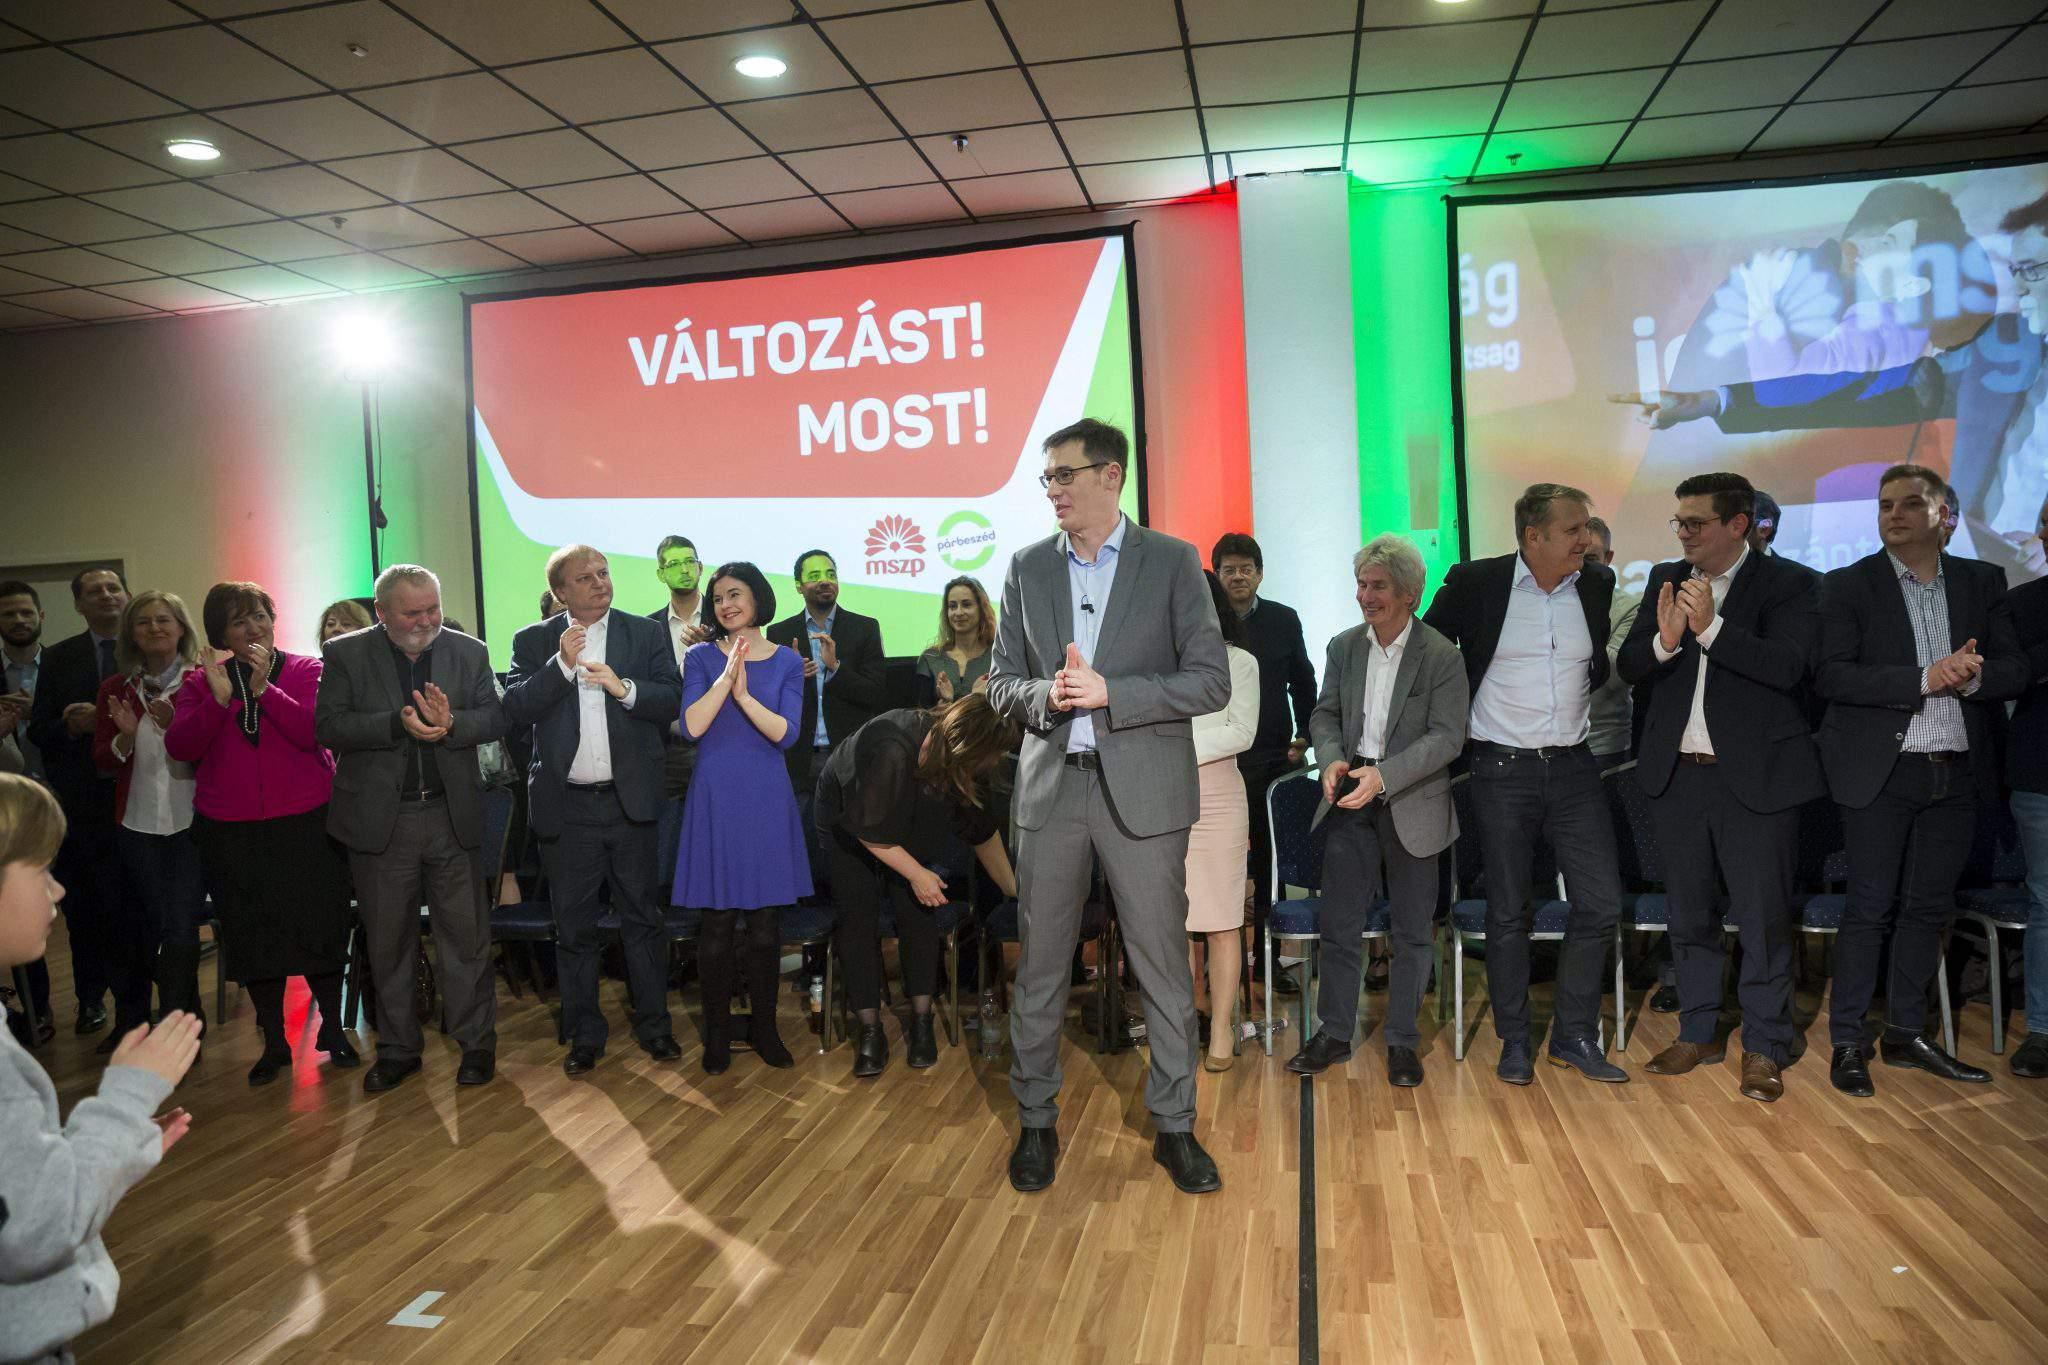 PM candidate Hungary leftist Karácsony